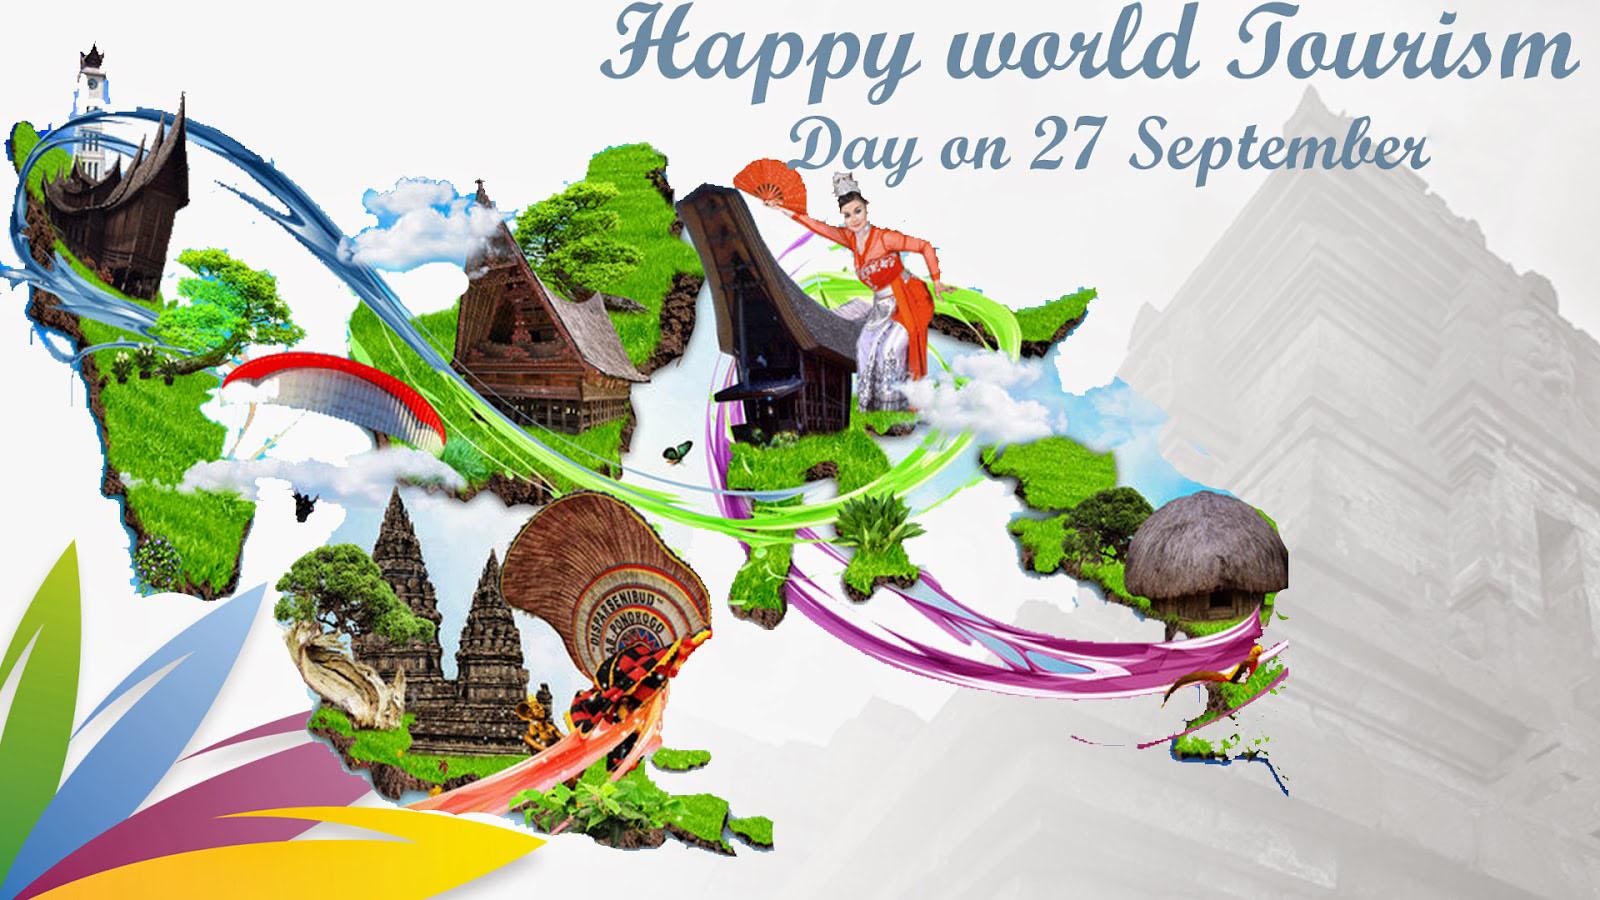 world tourism day september 27 hd latest wallpaper